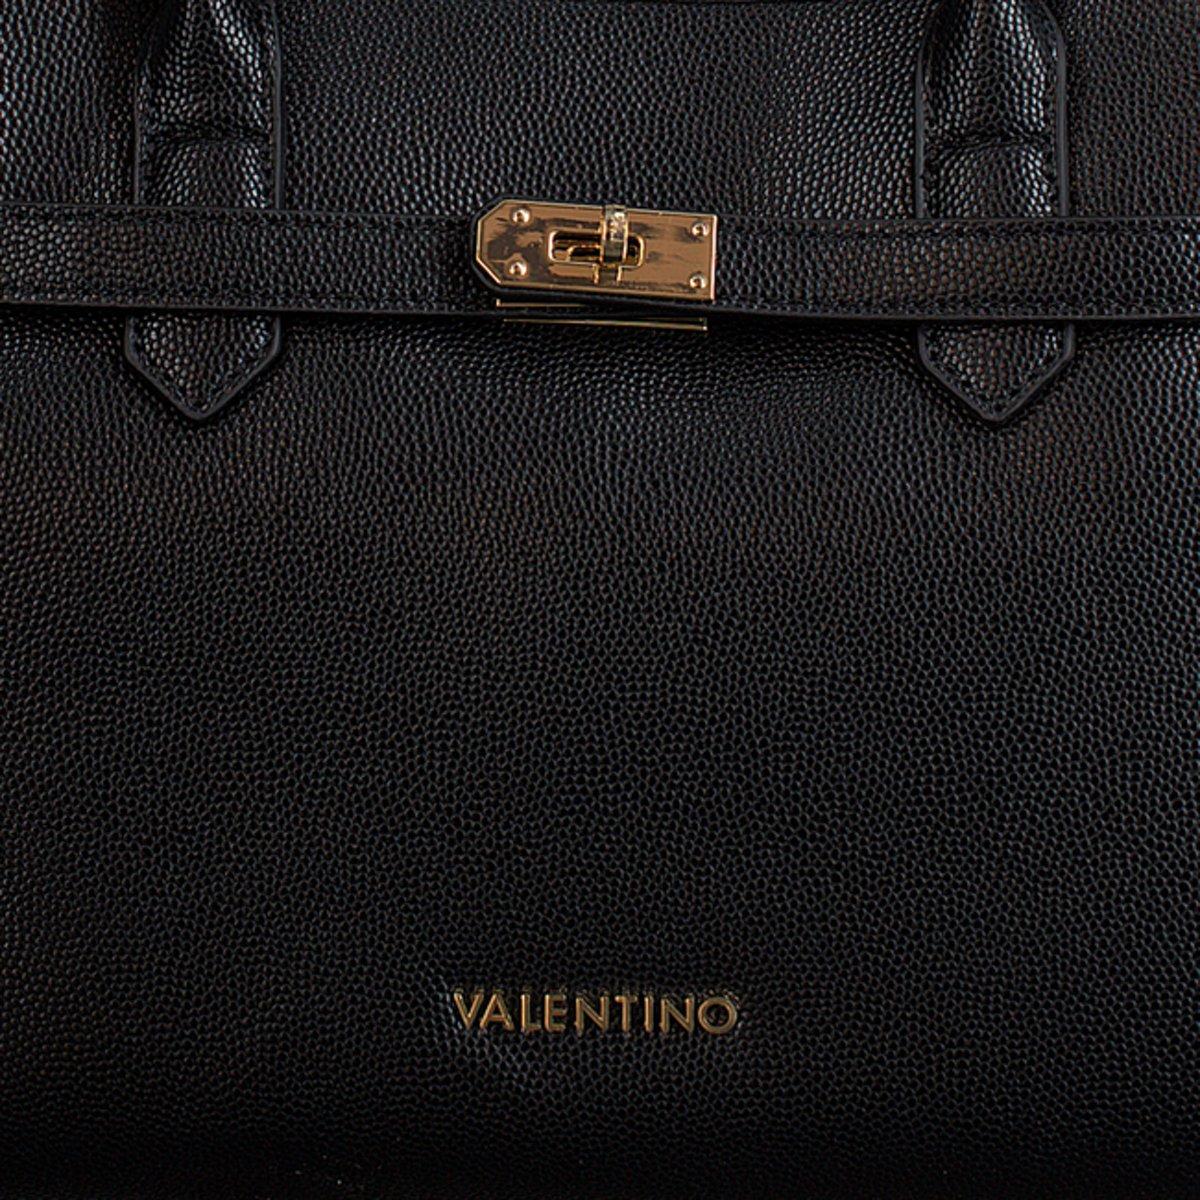 f52accfdddc bol.com   Valentino Dames Handtas Alien Kelly Queen Bag - Zwart